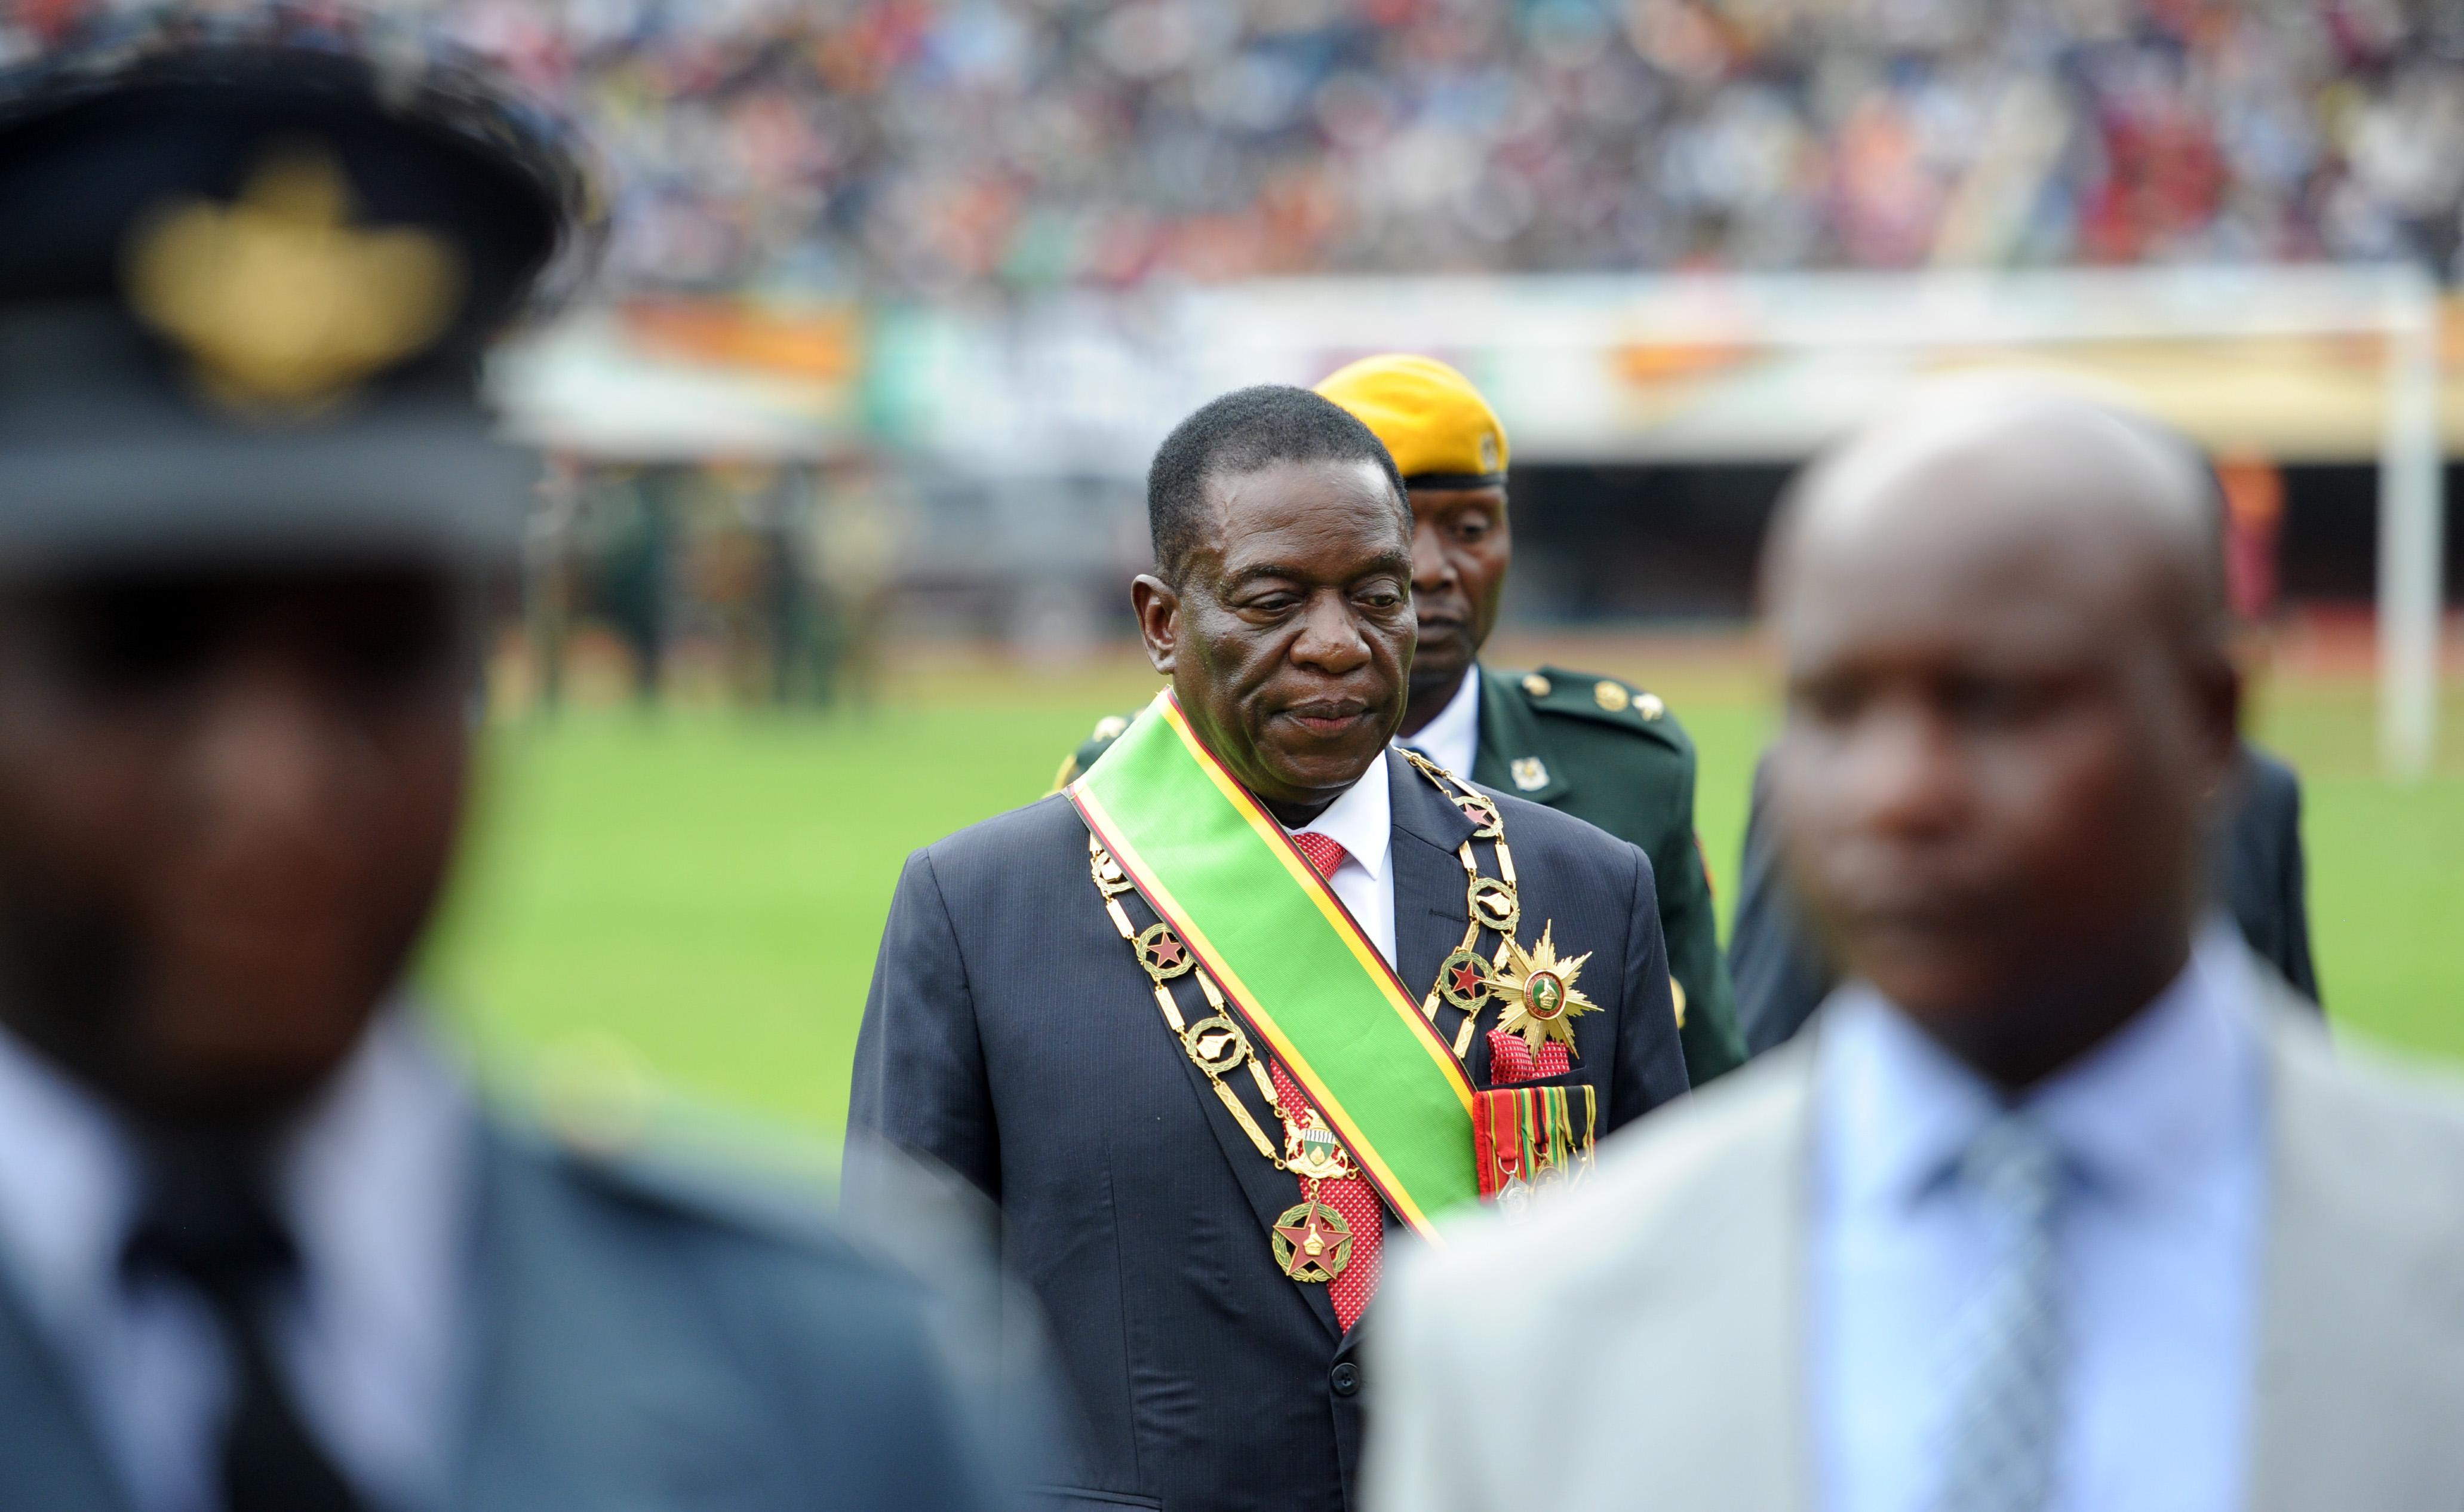 Mugabe doesnt remember firing me, says Zimbabwean president Mnangagwa